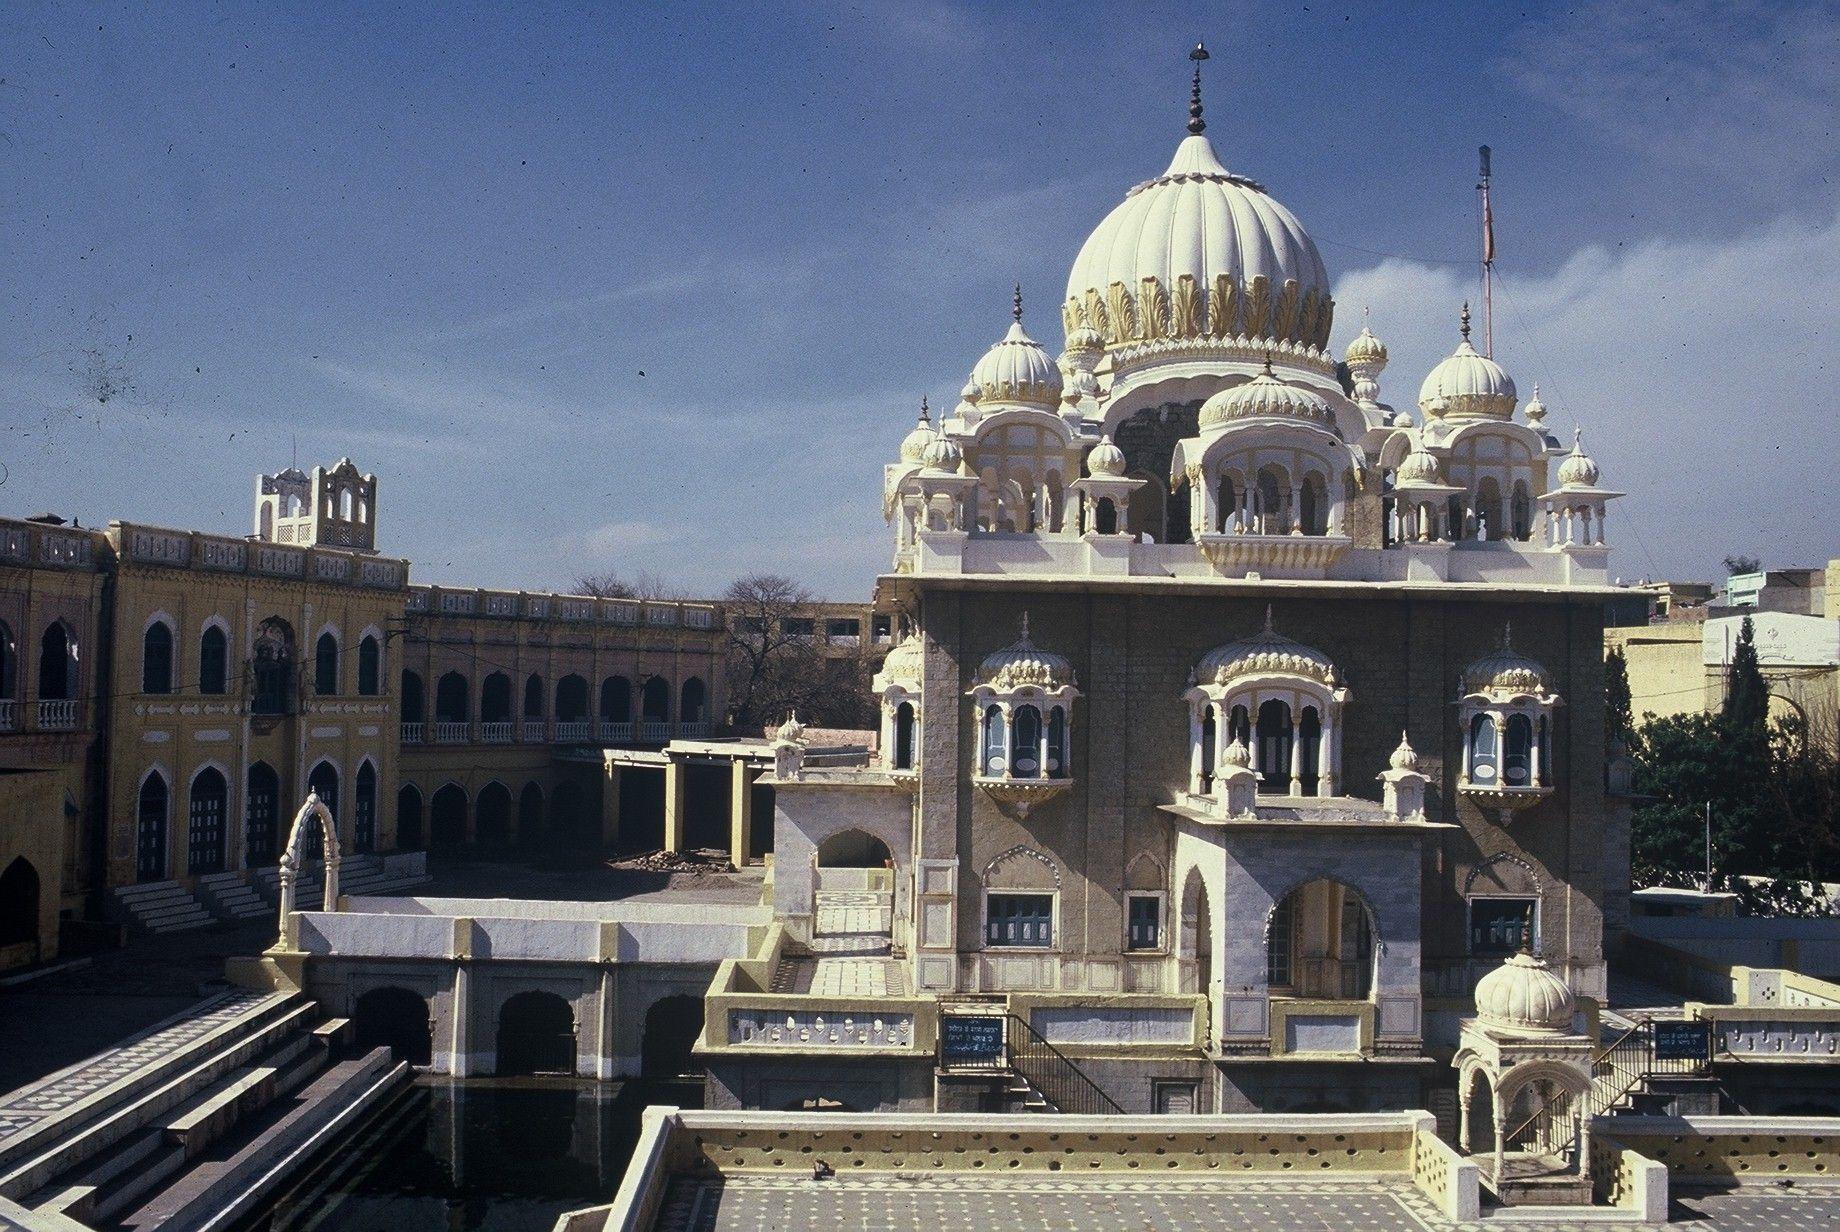 Gurdwara lahore pakistan pakistan culture asia